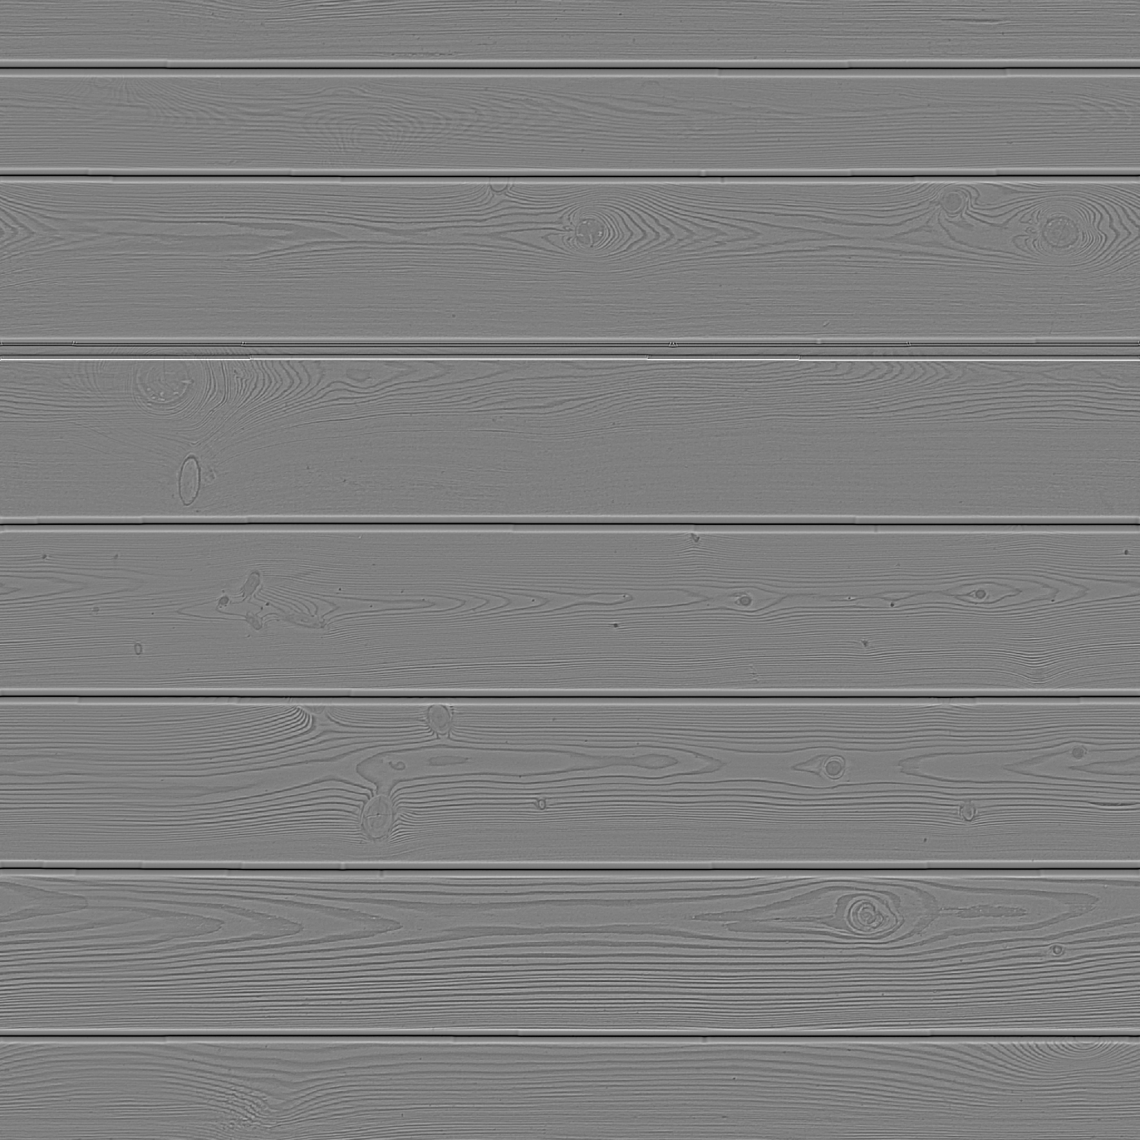 Planks-Wooden-05-Curvature